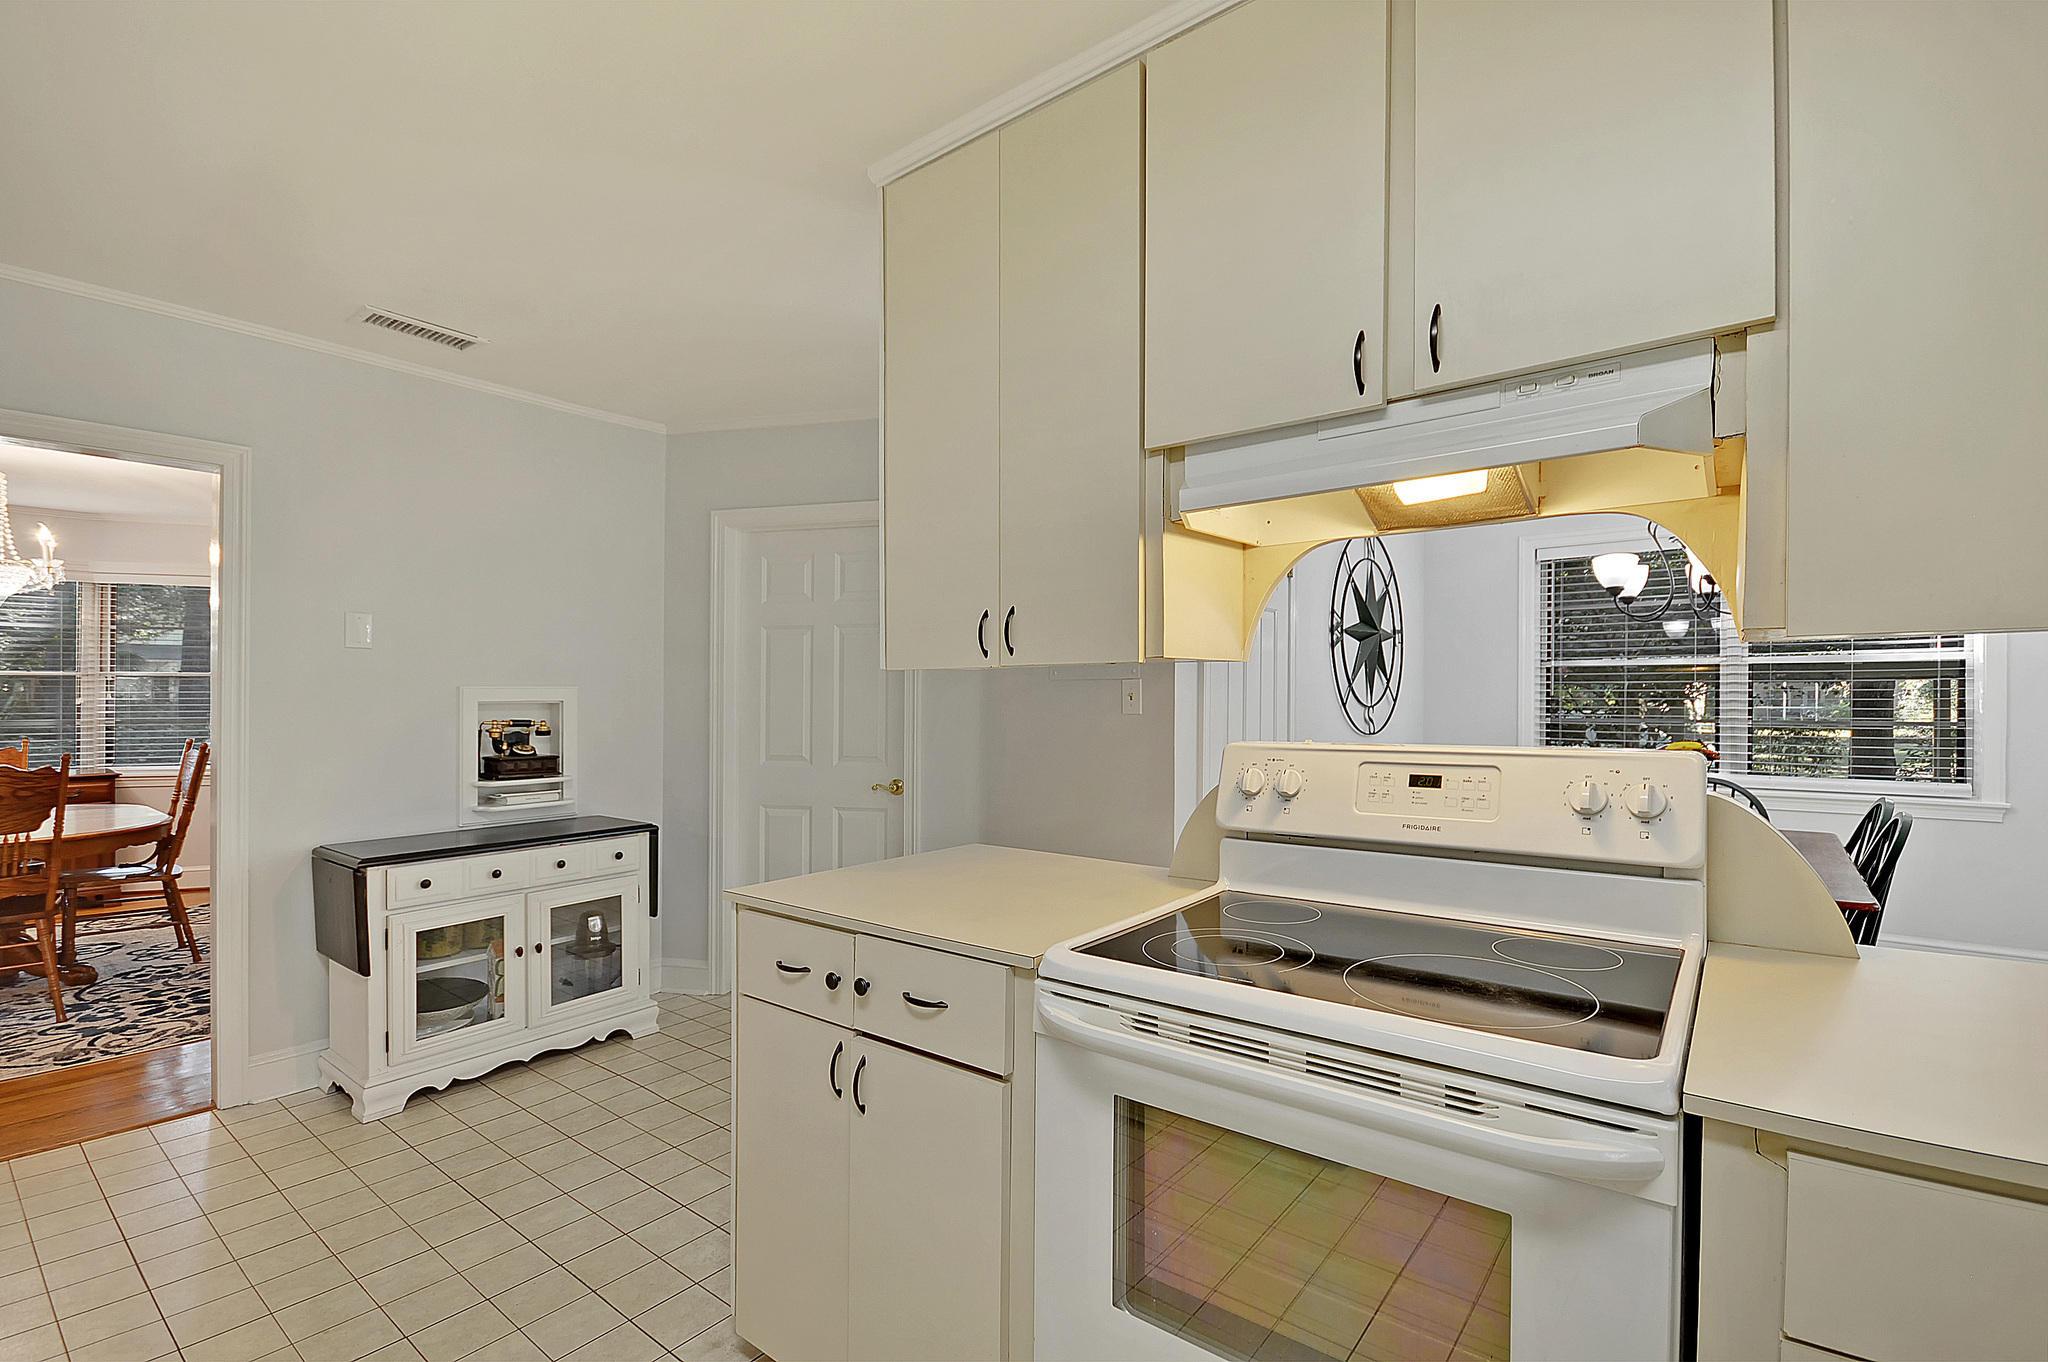 Edgewater Park Homes For Sale - 1356 Emory, Charleston, SC - 43